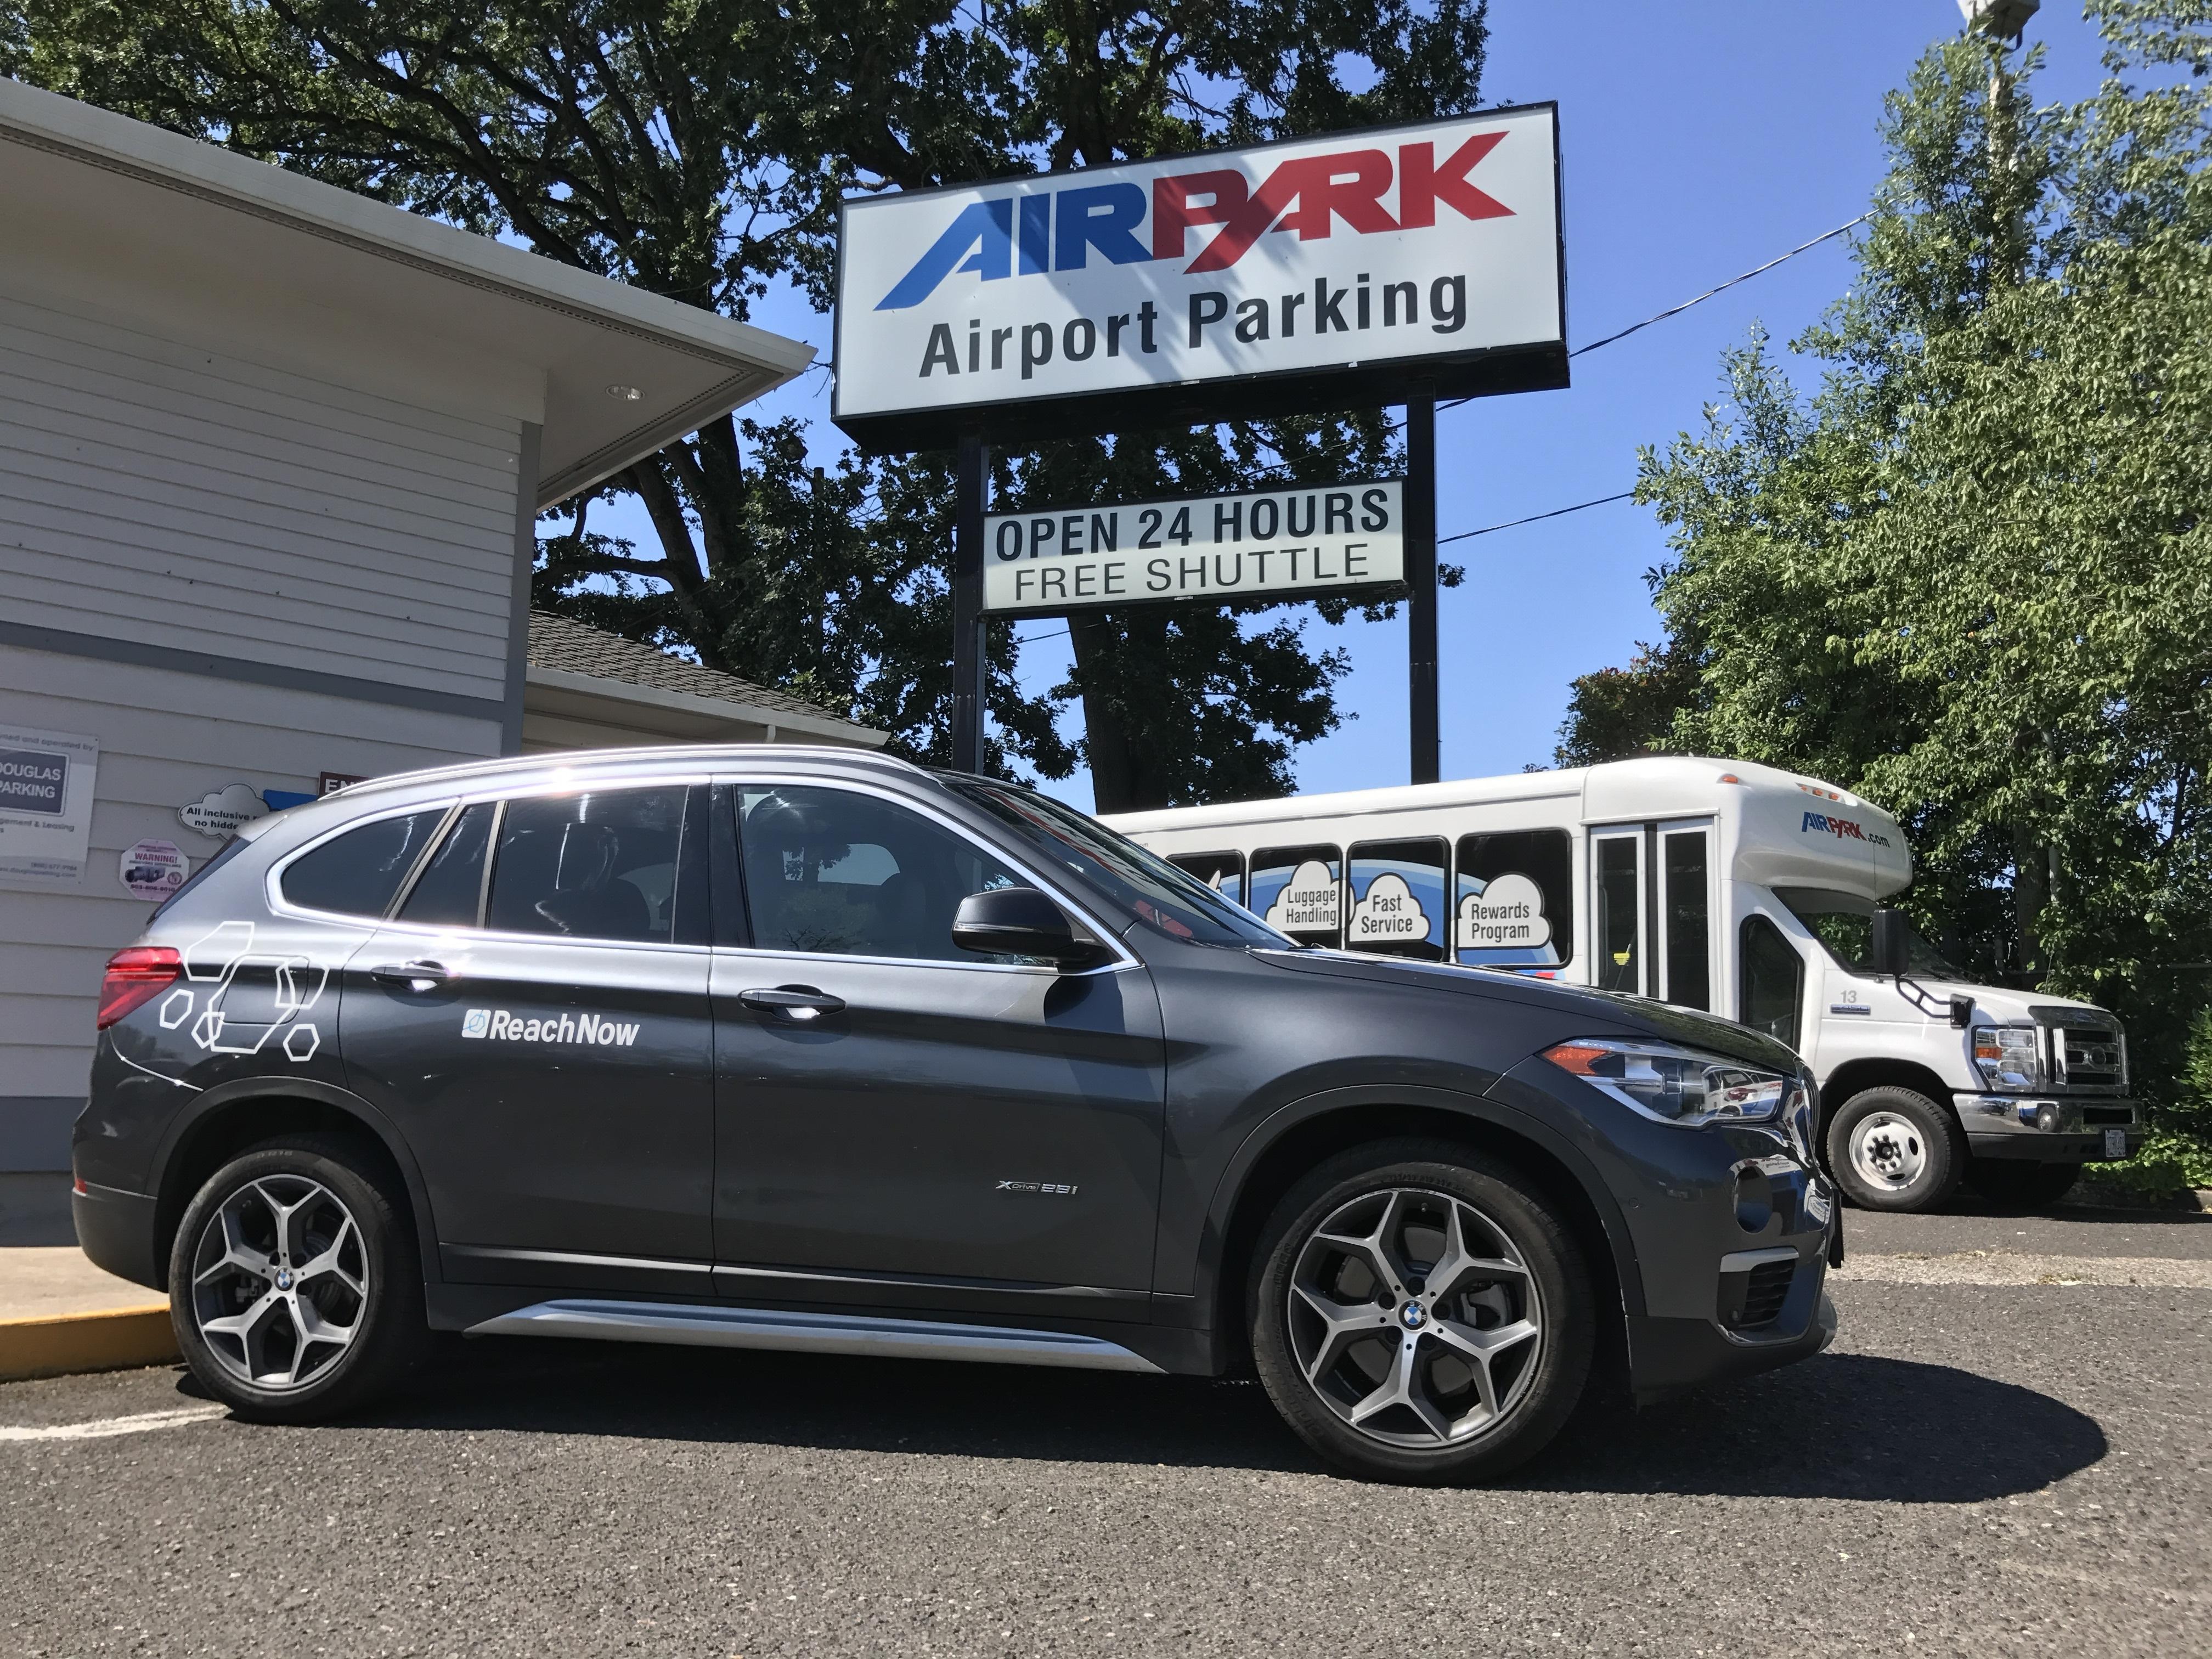 ReachNow Expands Service to Portland Airport